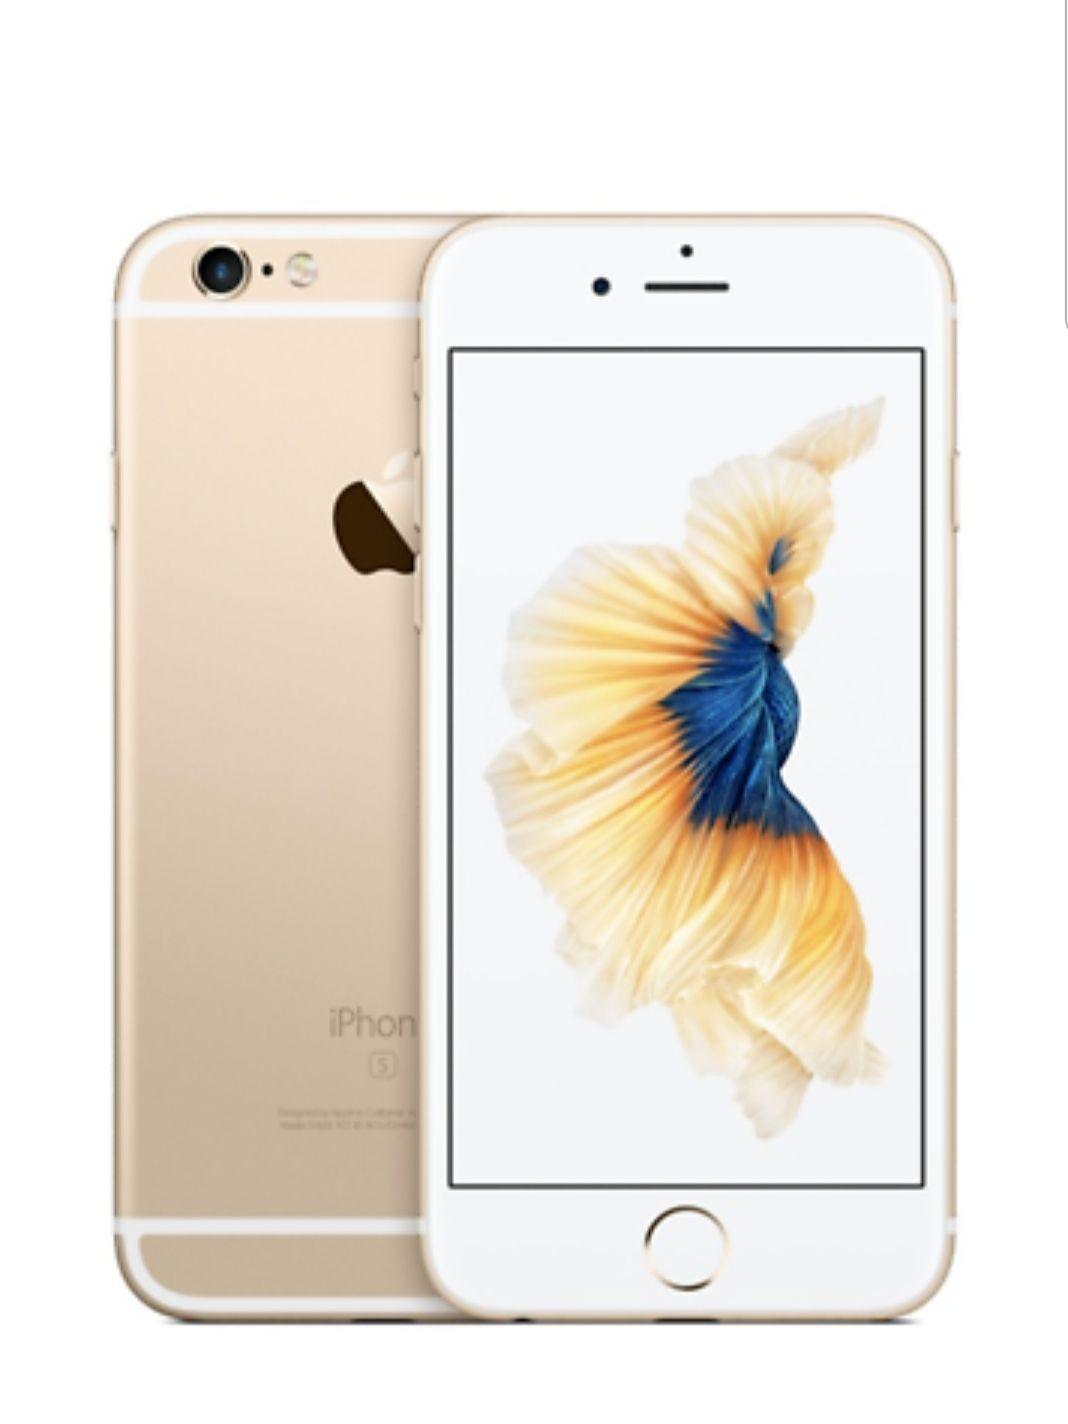 Apple iPhone 6S - 32GB - Gold (Ohne Simlock/Branding) - @Ebay, dt. Händler, Neu, bulk